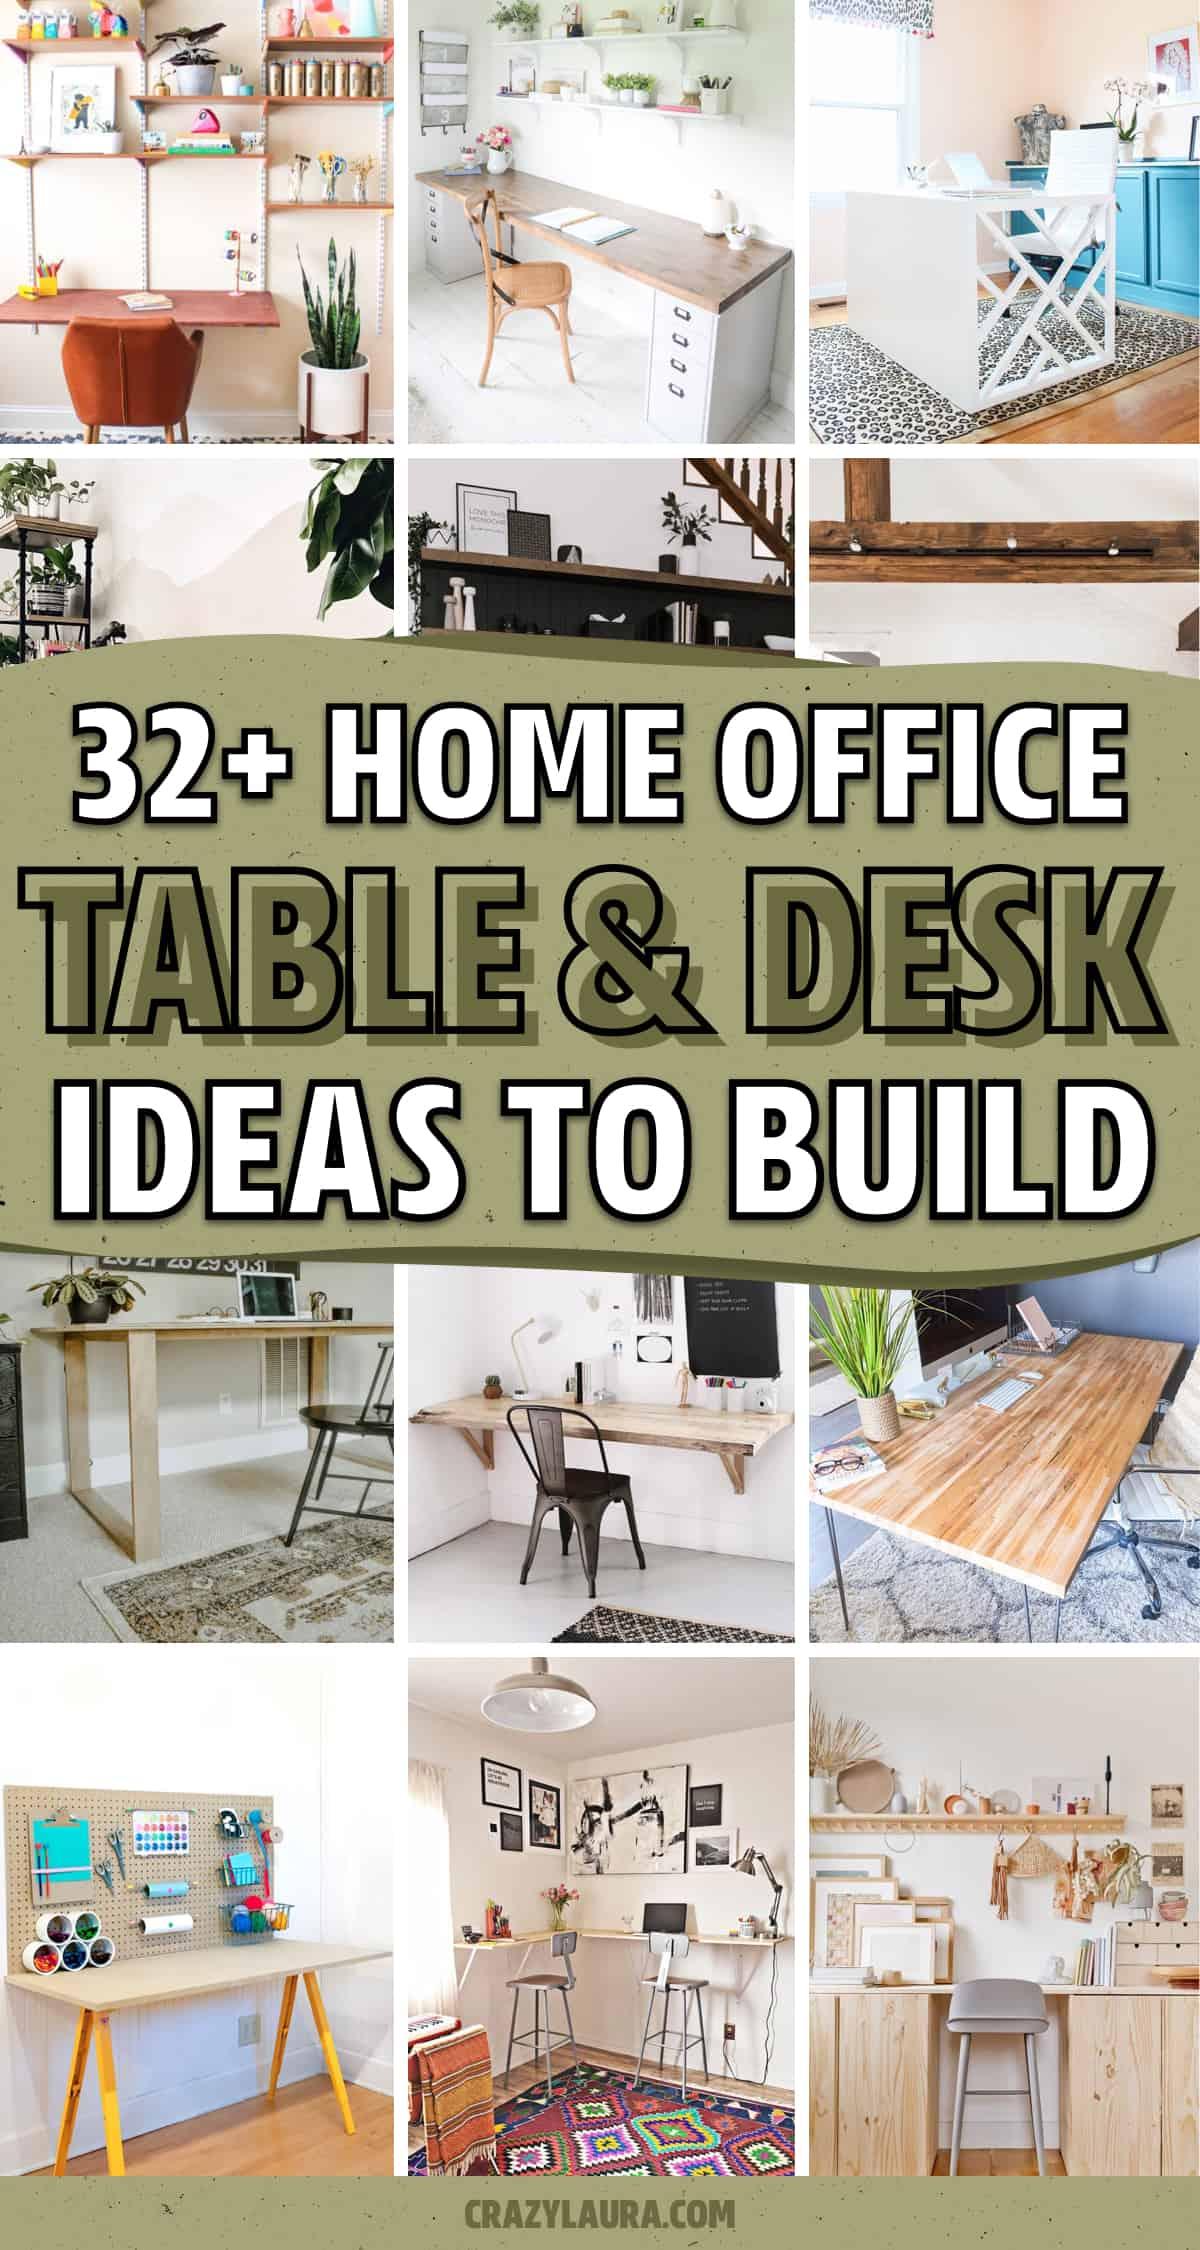 diy table ideas for home office